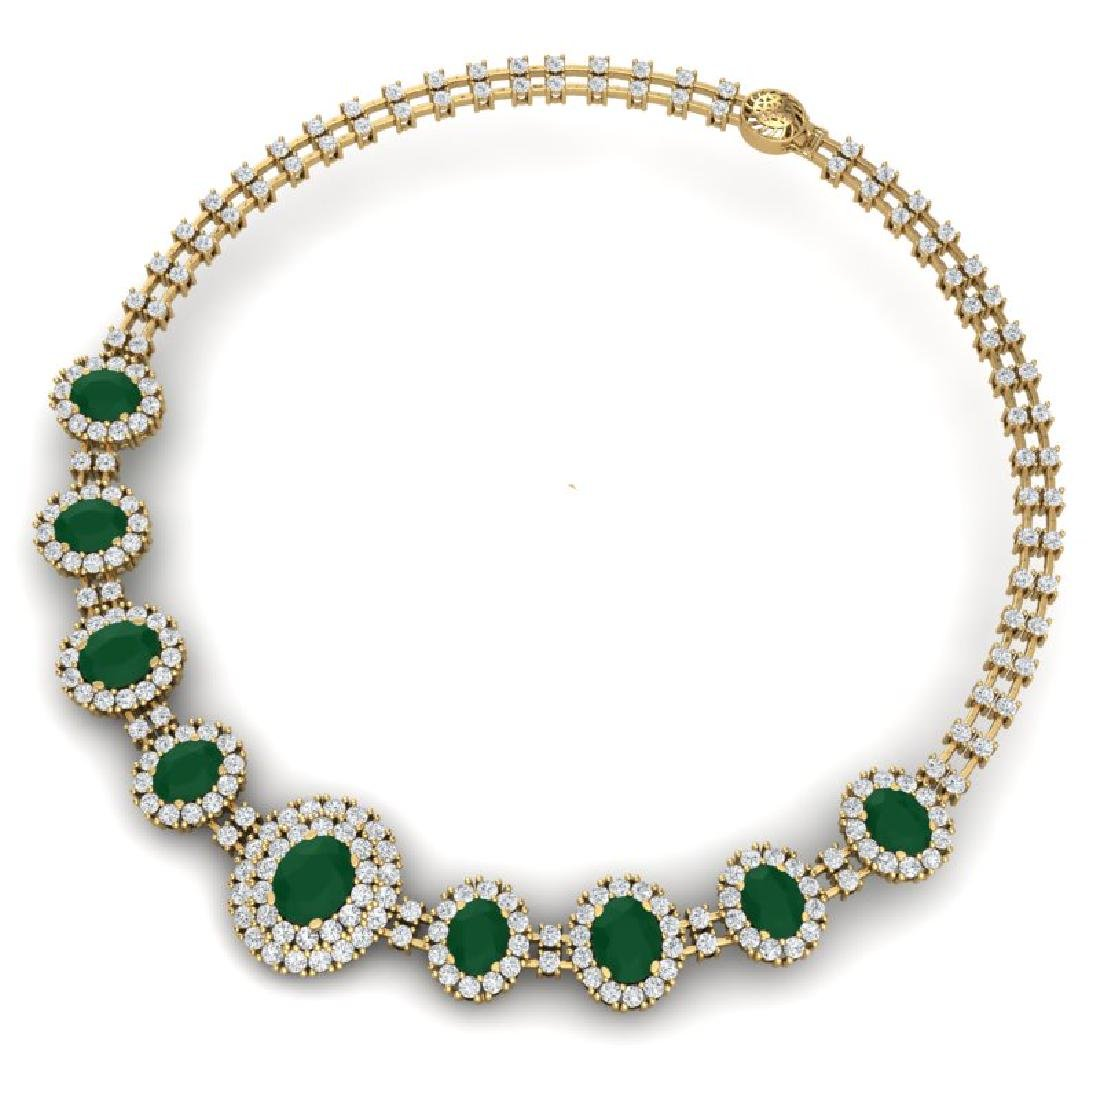 45.69 CTW Royalty Emerald & VS Diamond Necklace 18K - 3